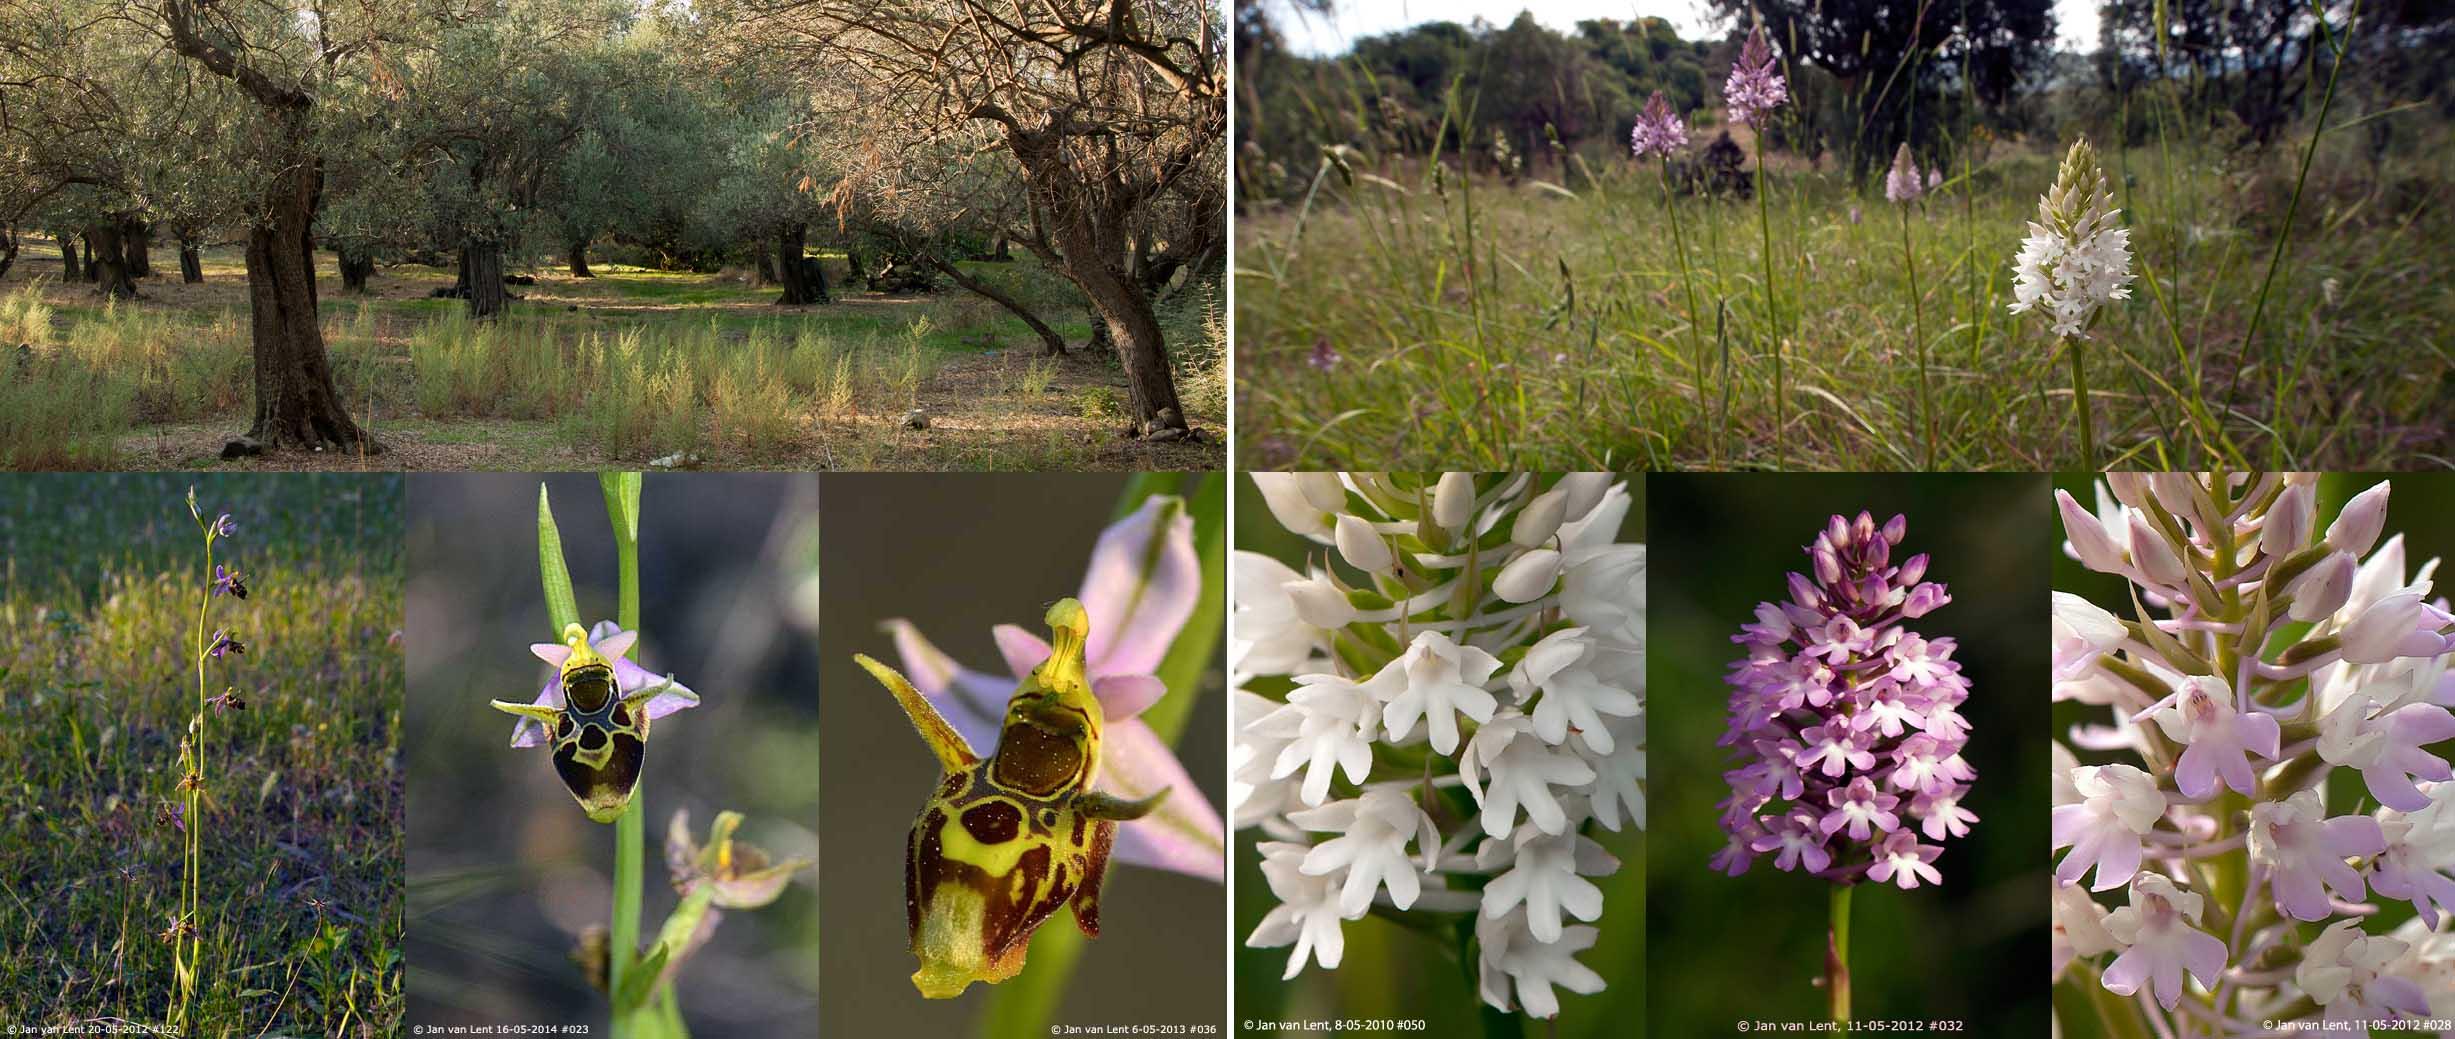 Ophrys phrygia & A.pyramidalis, Eftalou-5 86,62x36,66